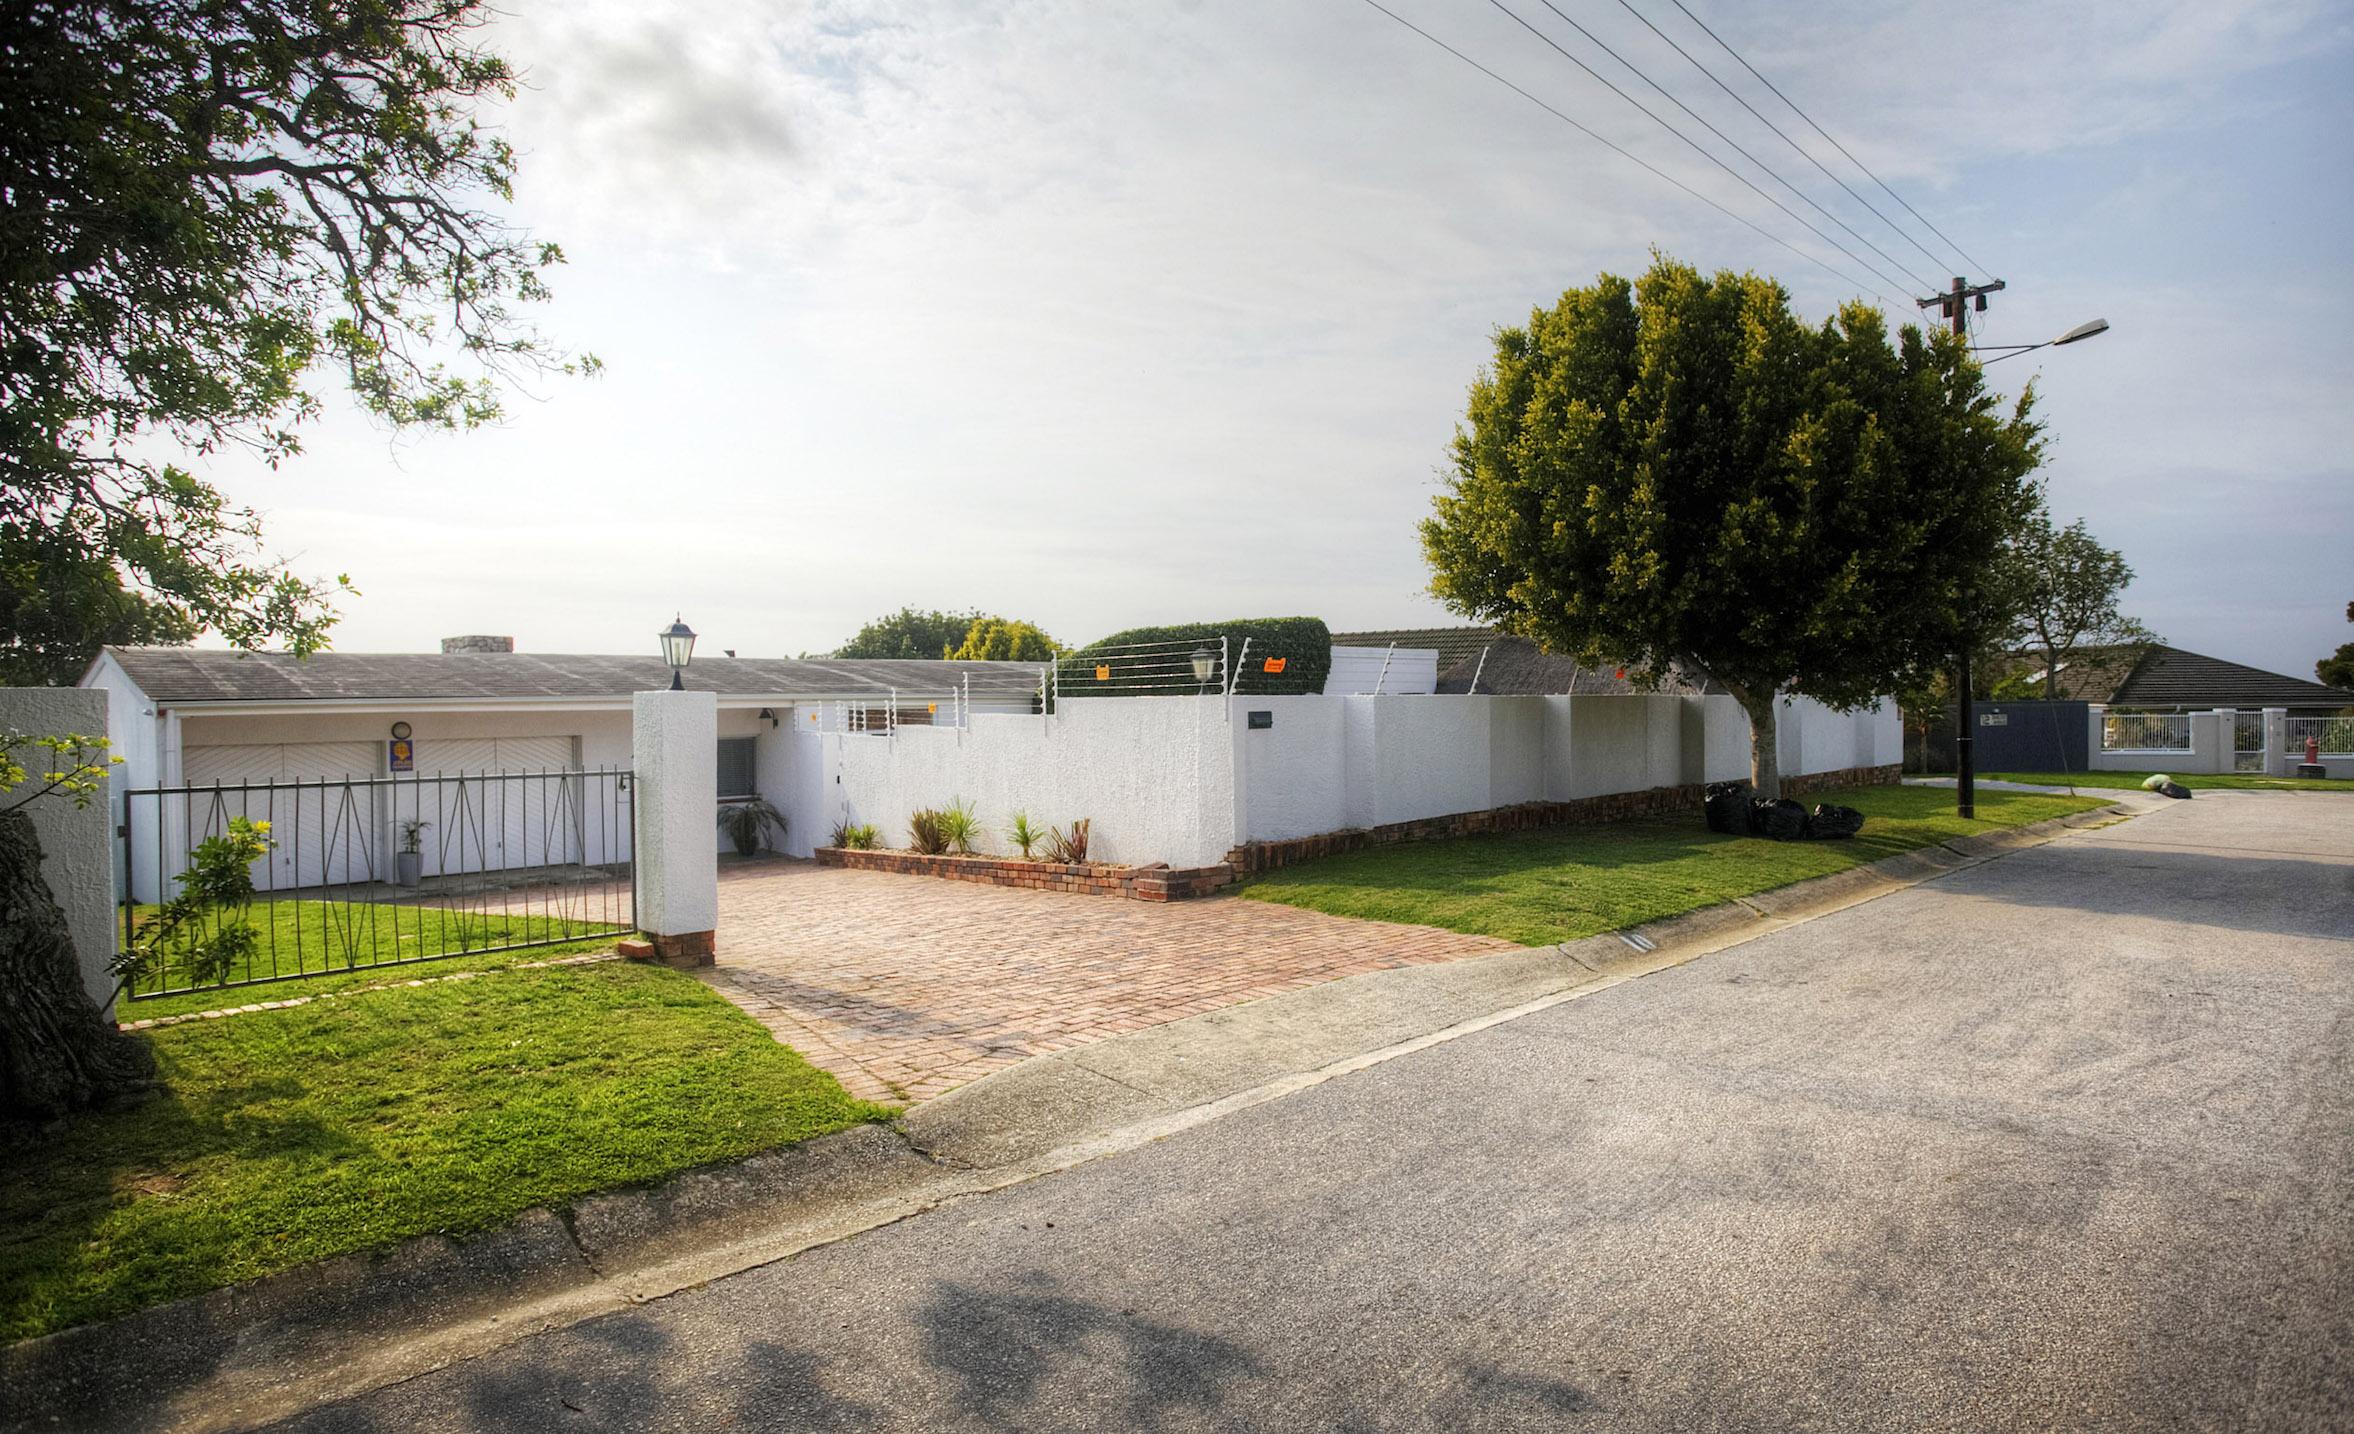 3 BedroomHouse For Sale In Linkside